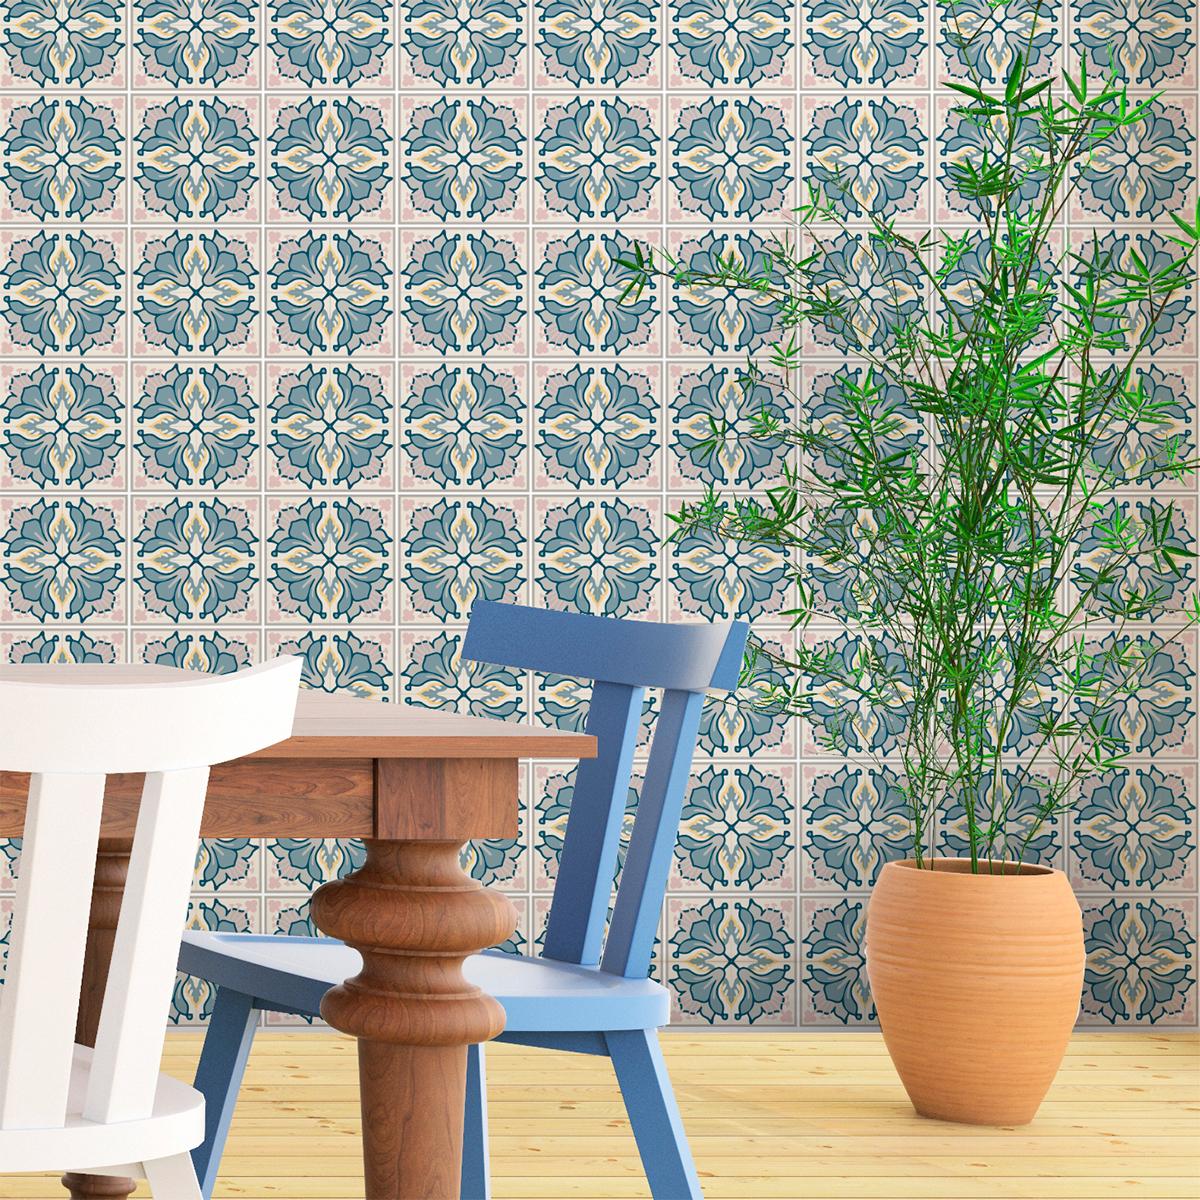 30 stickers carreaux de ciment azulejos aretha cuisine. Black Bedroom Furniture Sets. Home Design Ideas